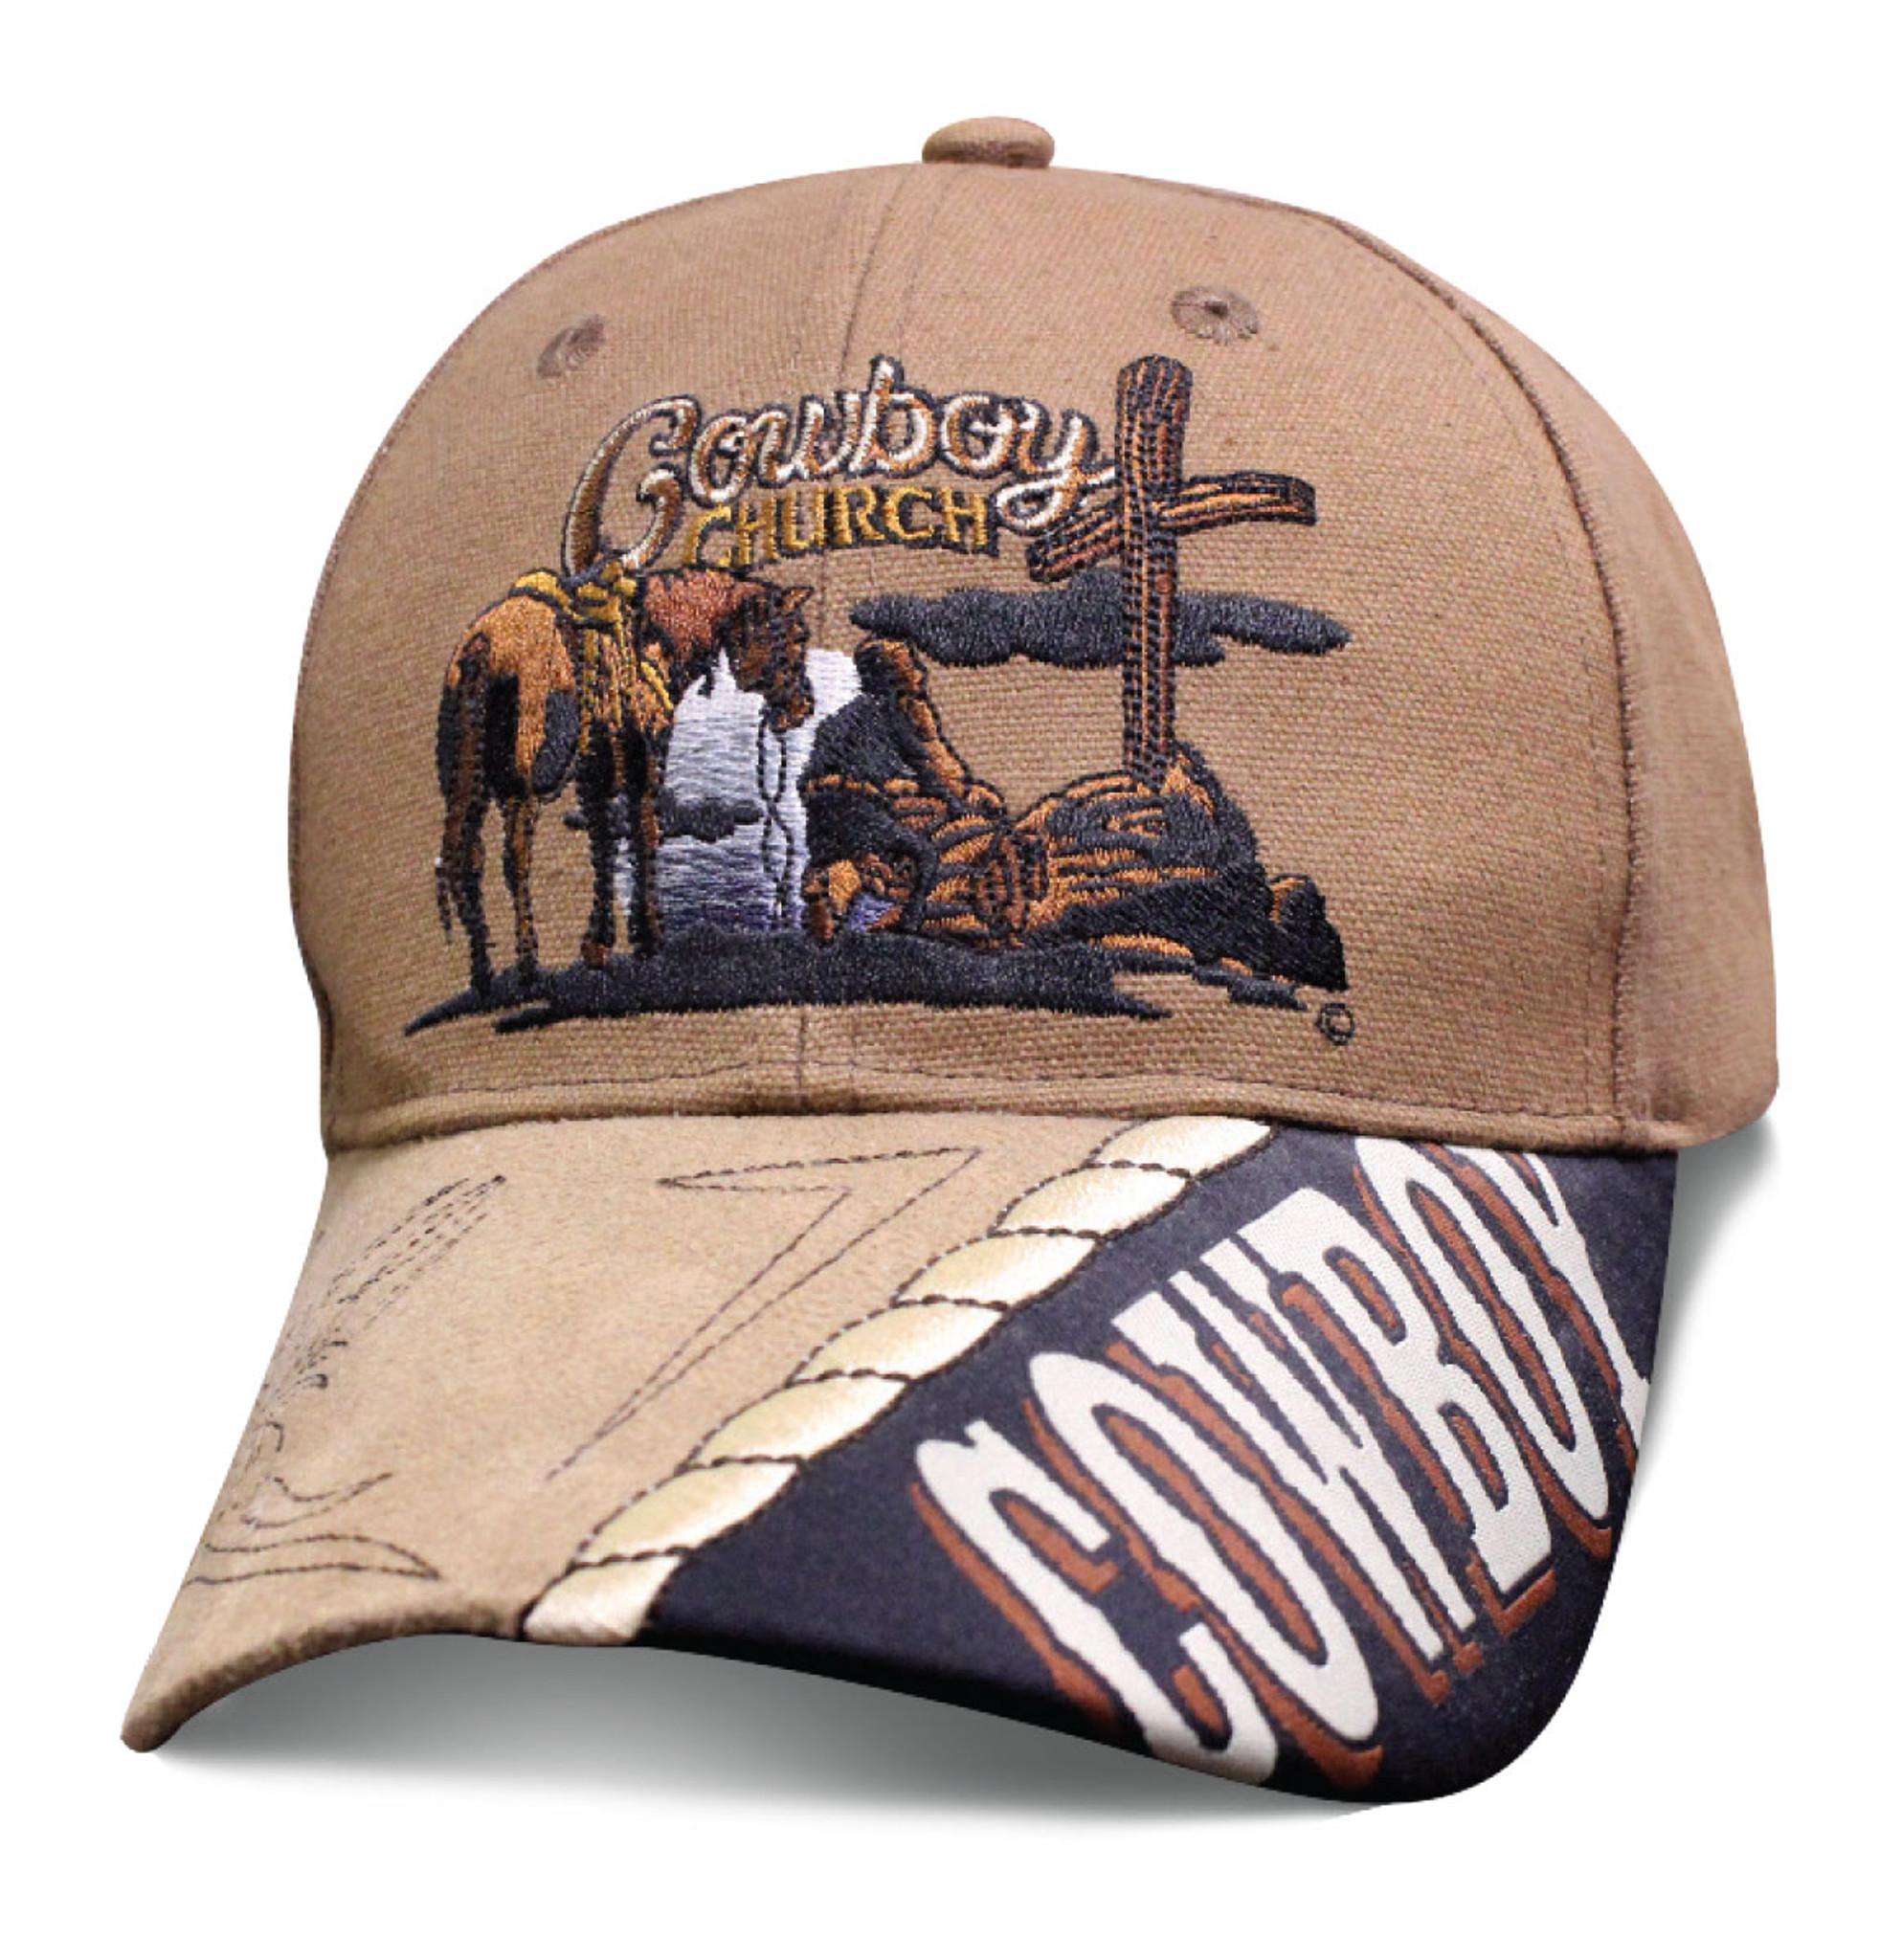 b6e8c0e156e Cowboy Church